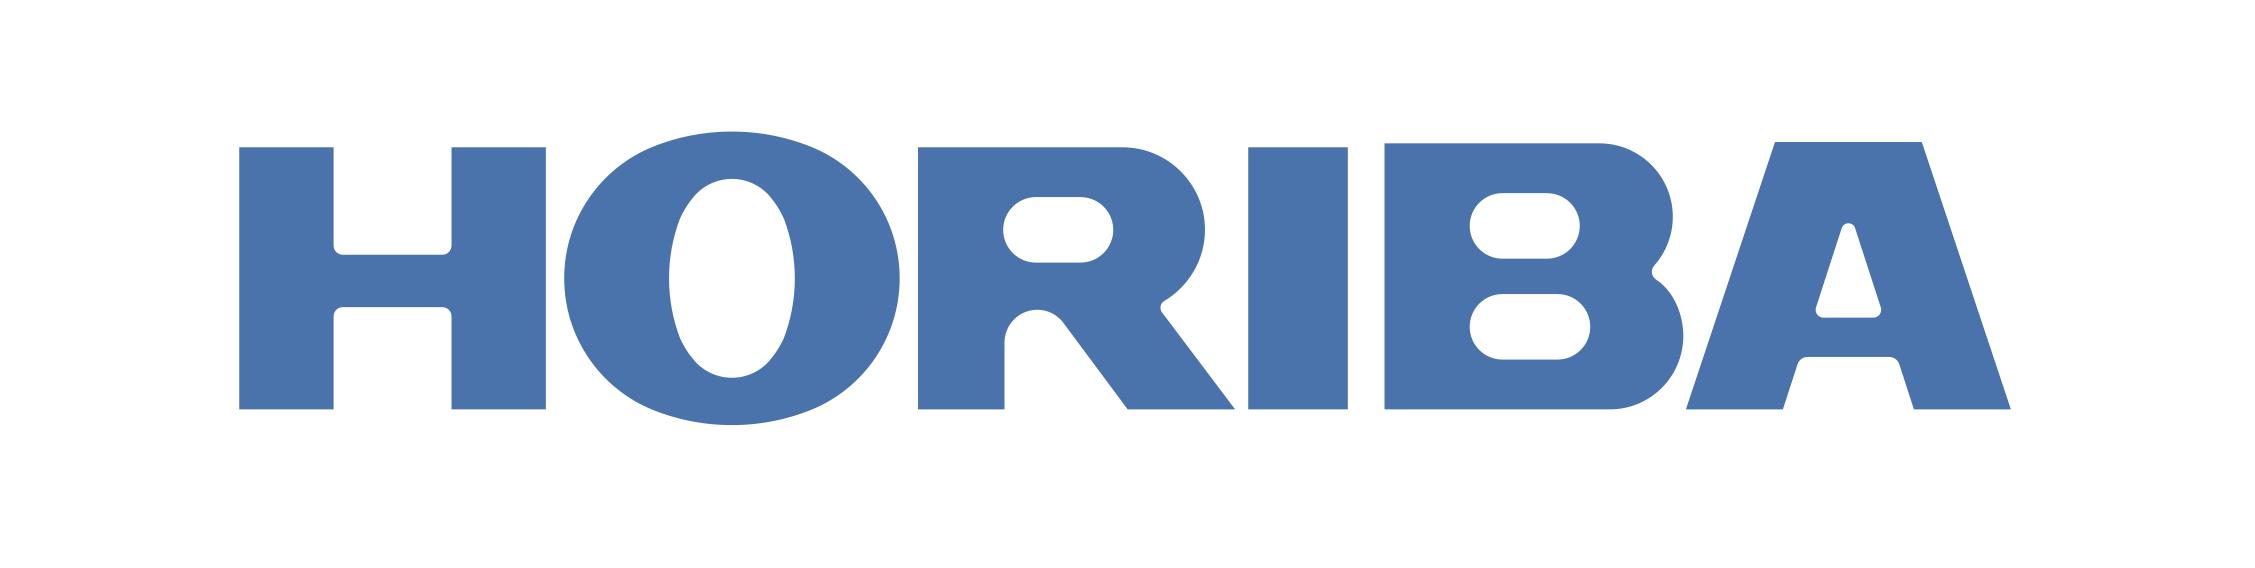 HOIRBA_logo